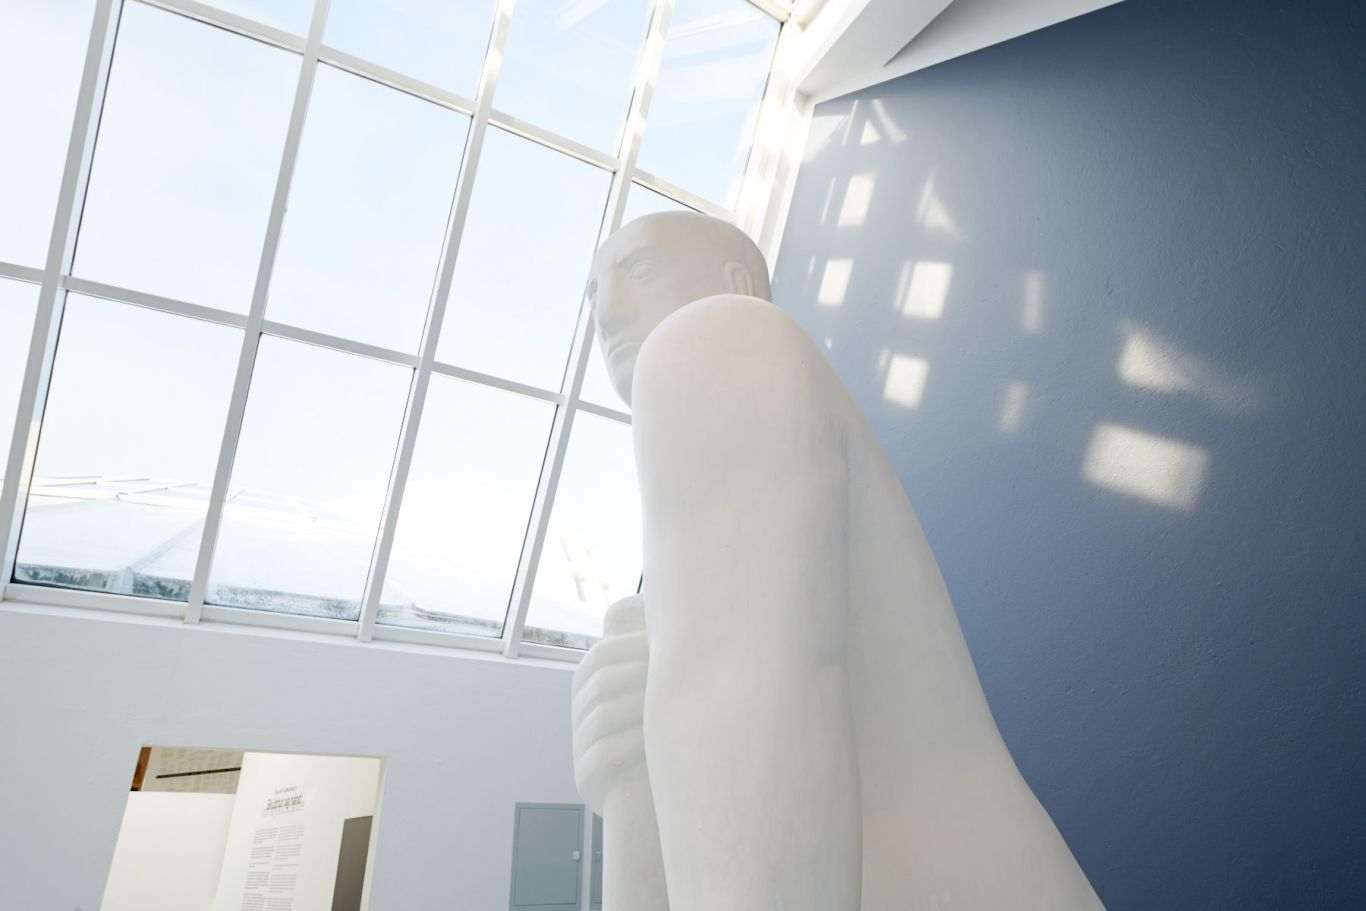 Ásmundur Sveinsson: Under the Same Sky – Art in Public Spaces